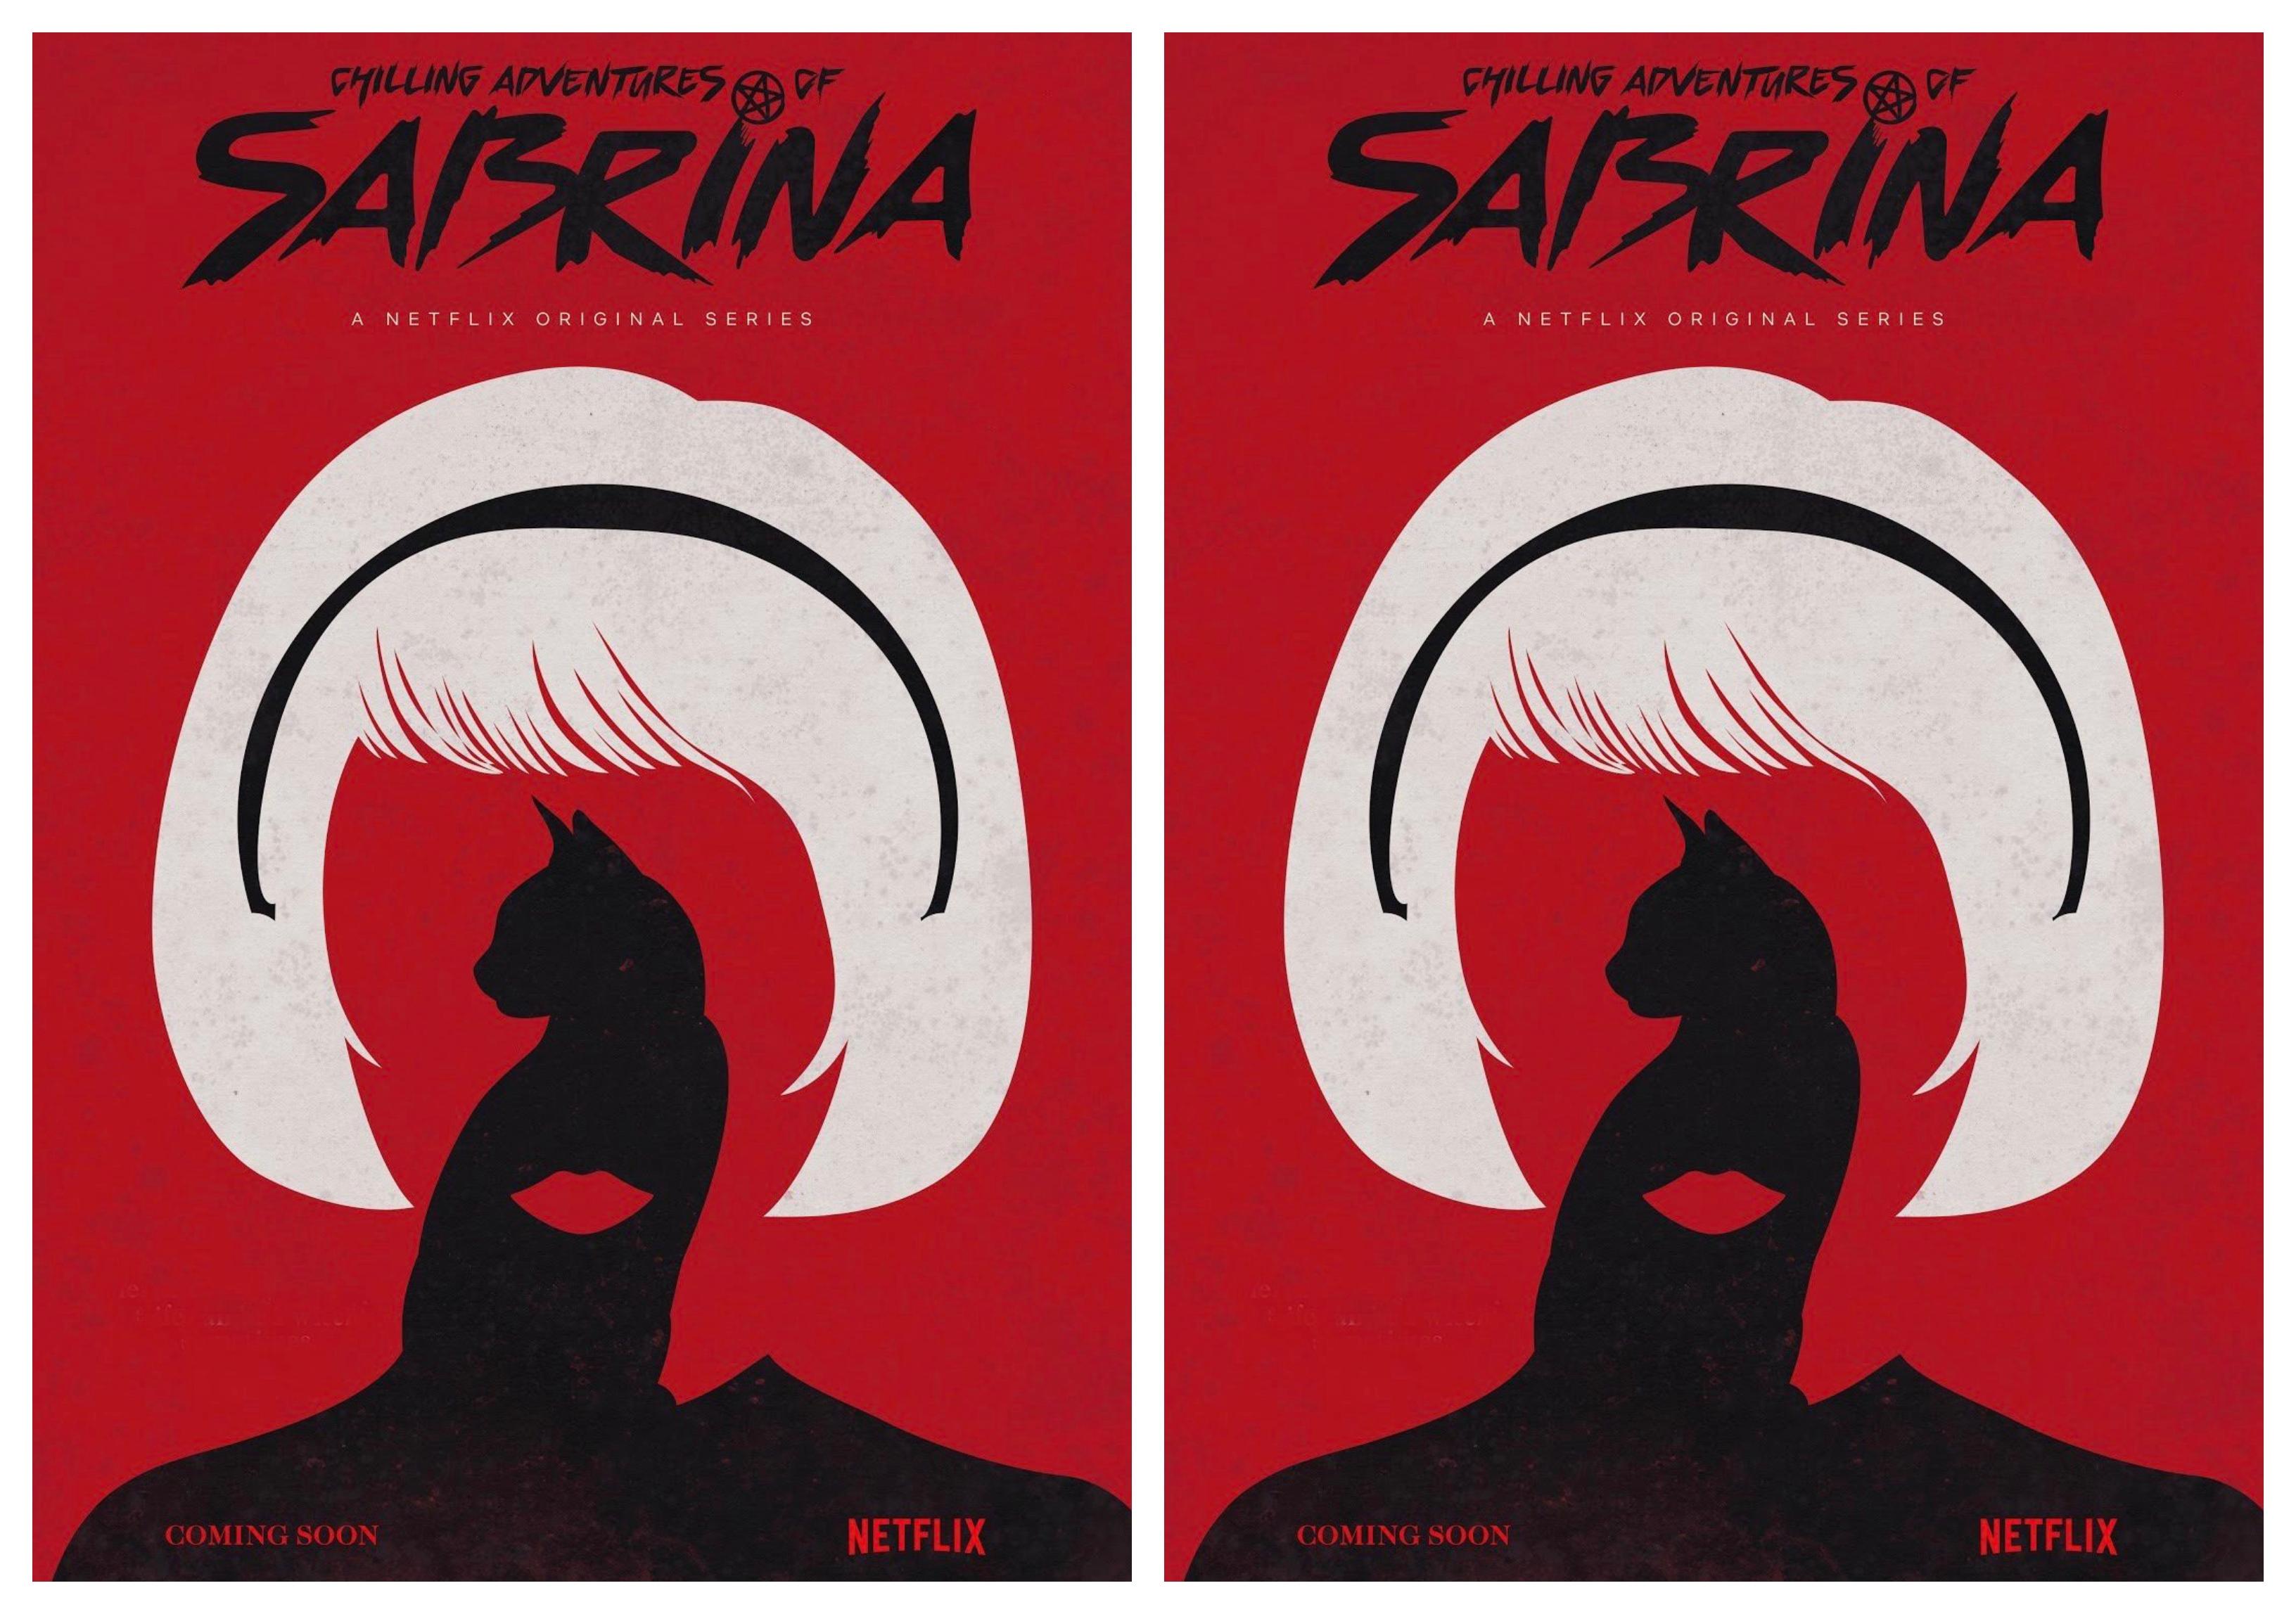 chilling adventures of sabrina - photo #10